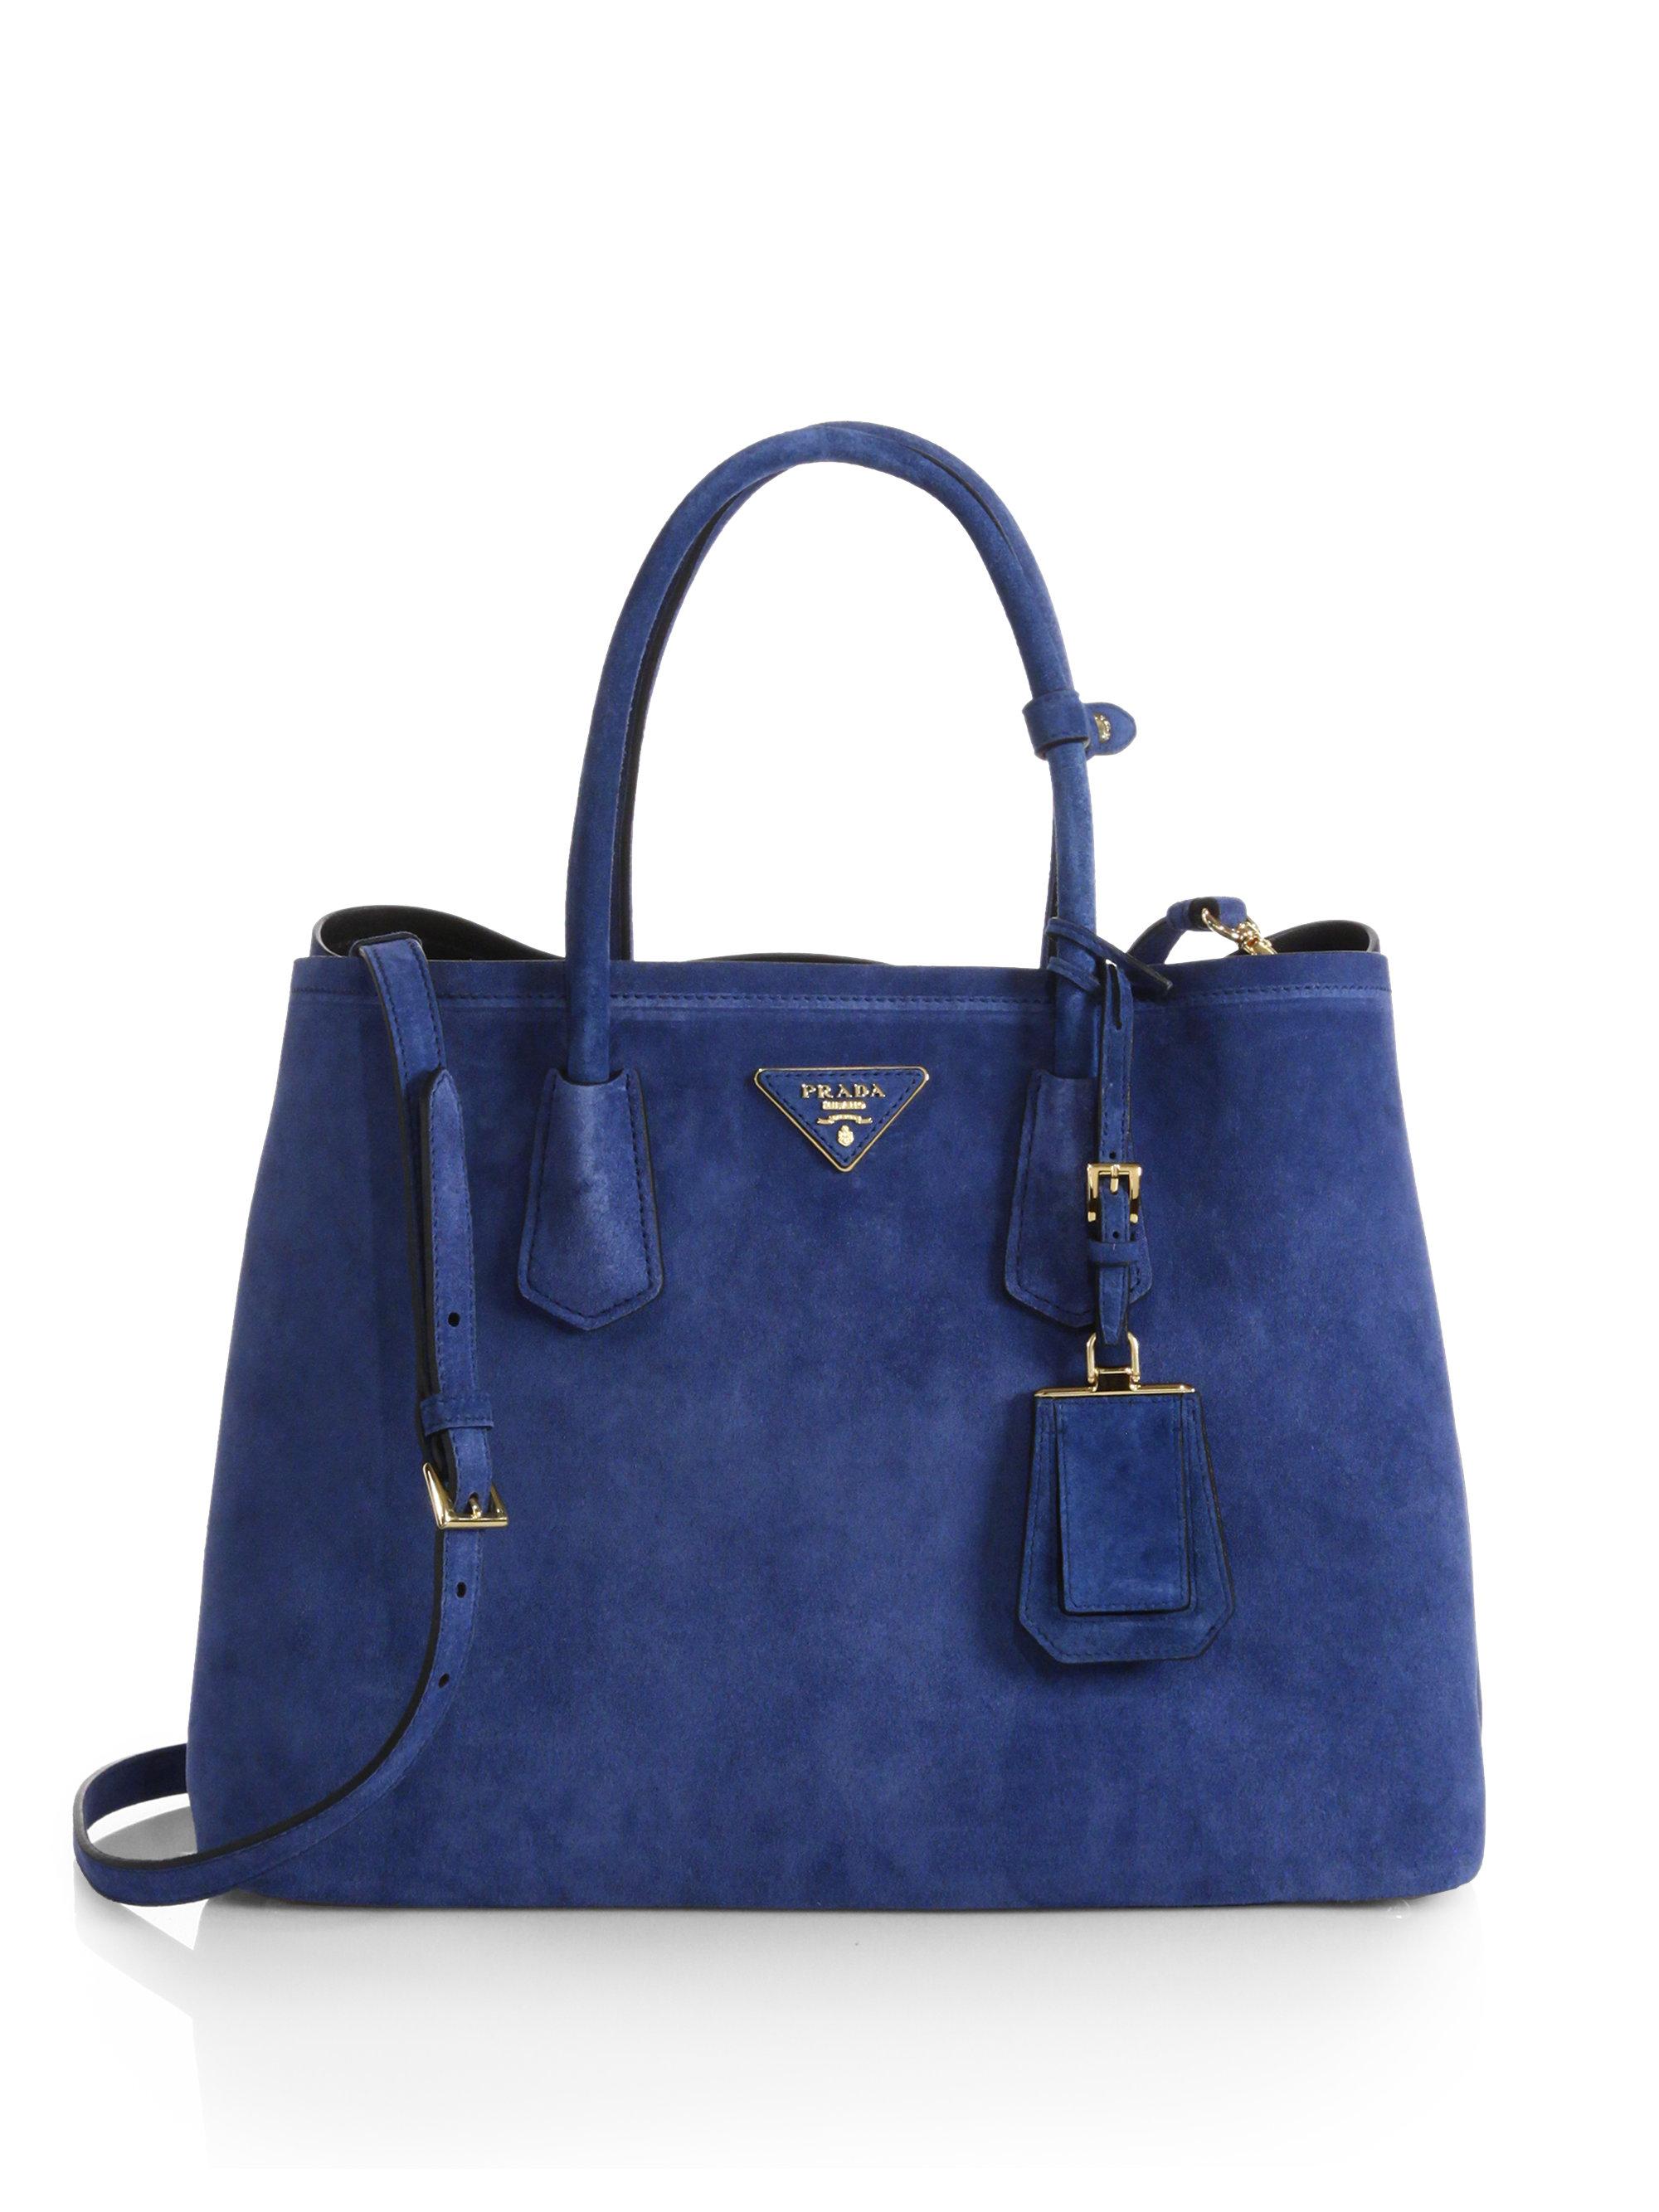 3fdddcb9e707 Lyst - Prada Suede Double Bag in Blue